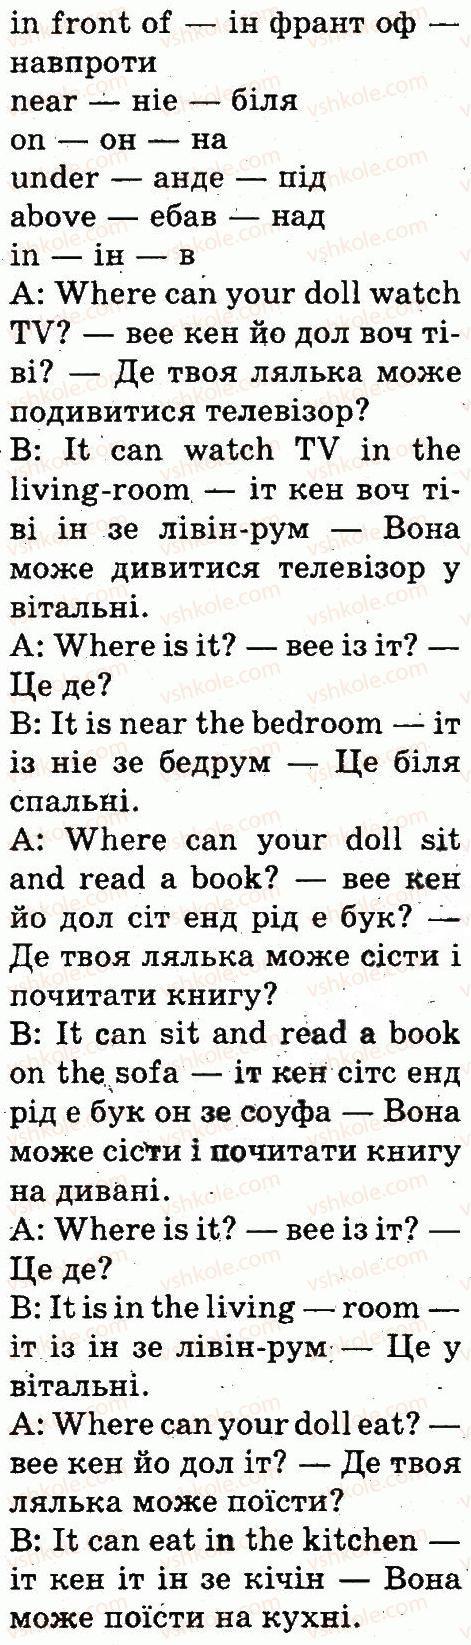 3-anglijska-mova-od-karpyuk-2013--unit-2-my-dear-family-lesson-7-3-rnd6115.jpg